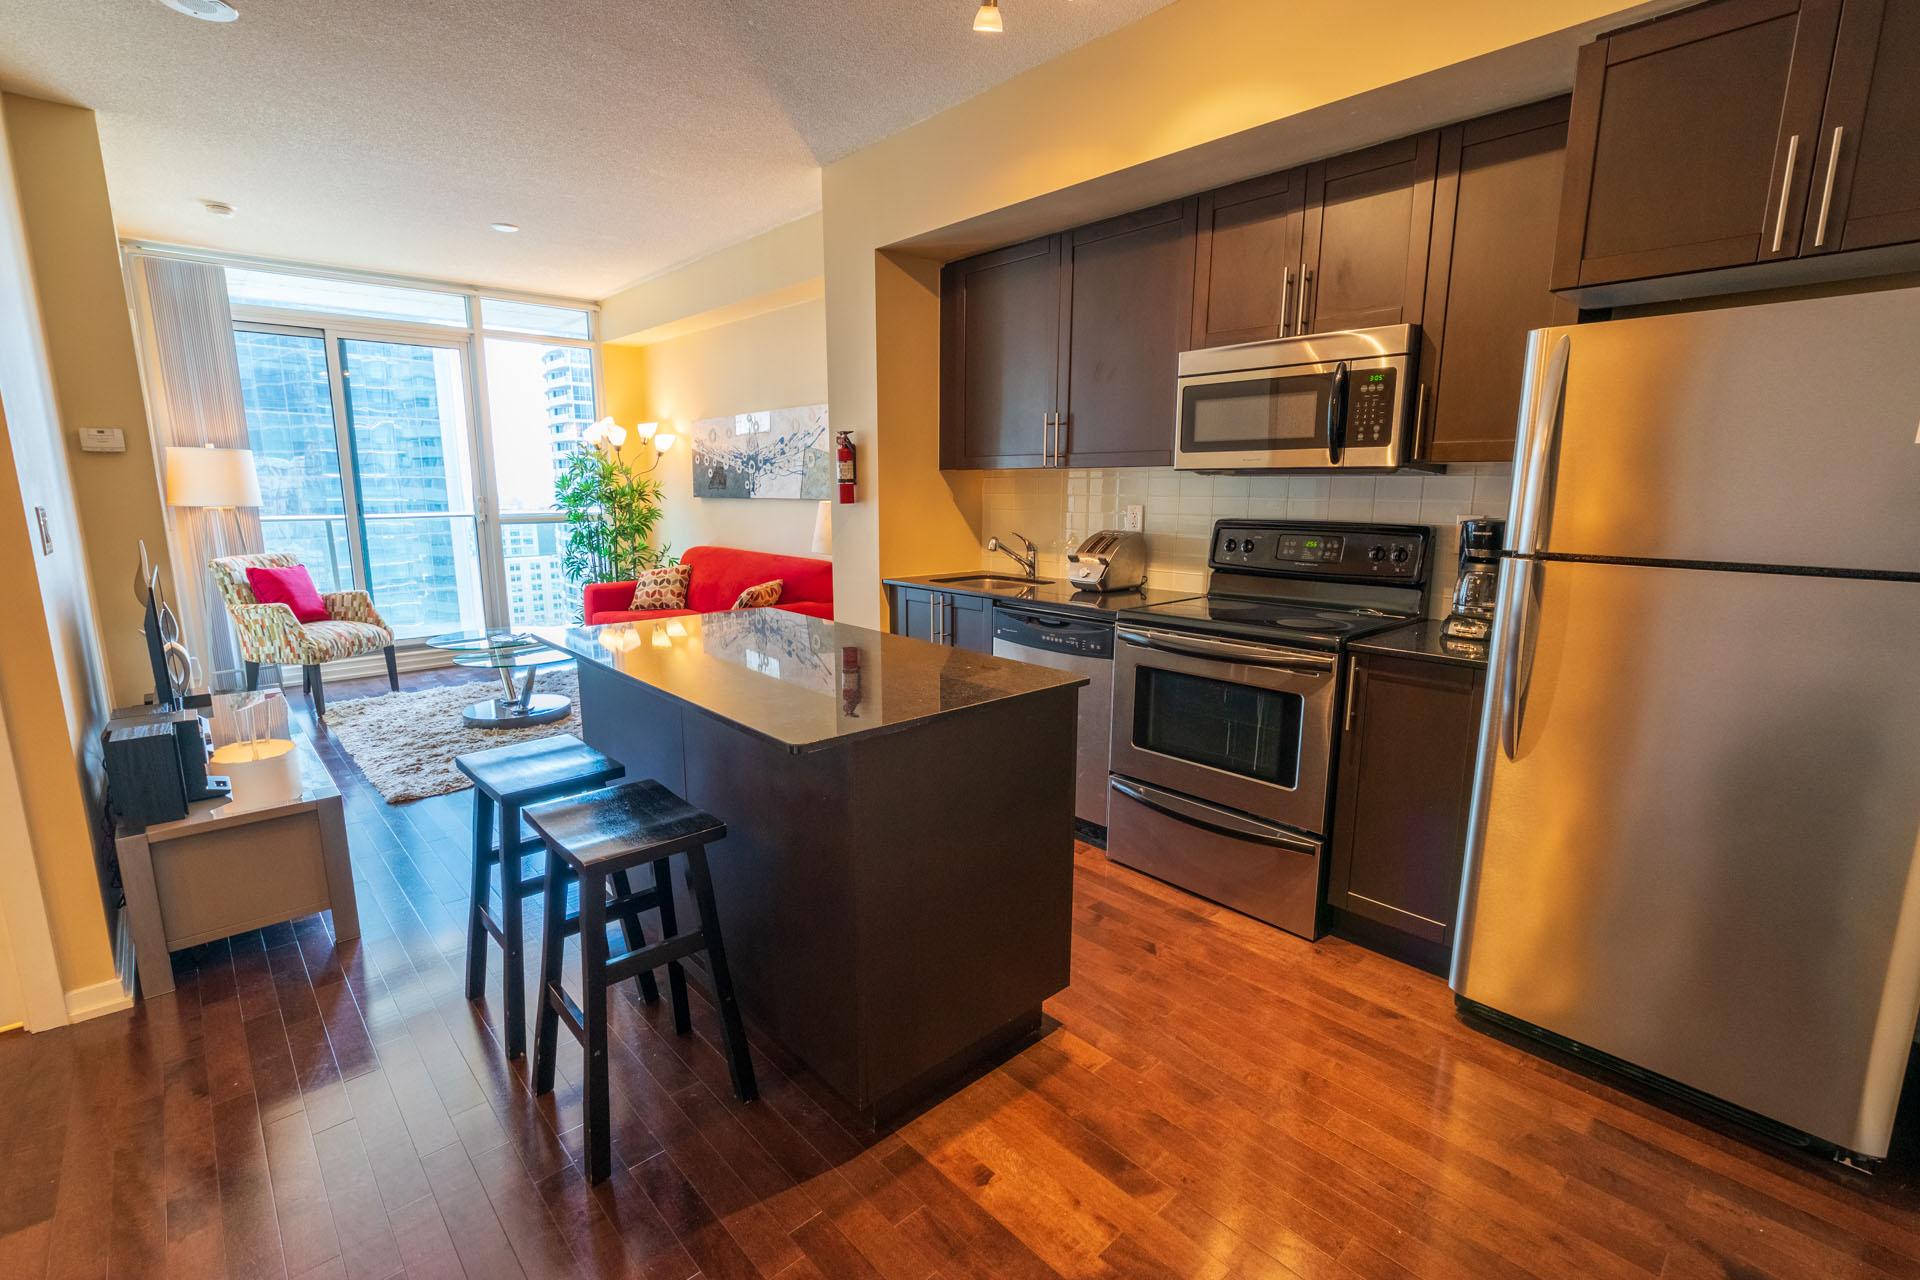 Rental at Maple Leaf Square Downtown Toronto Kitchen Den Living Room